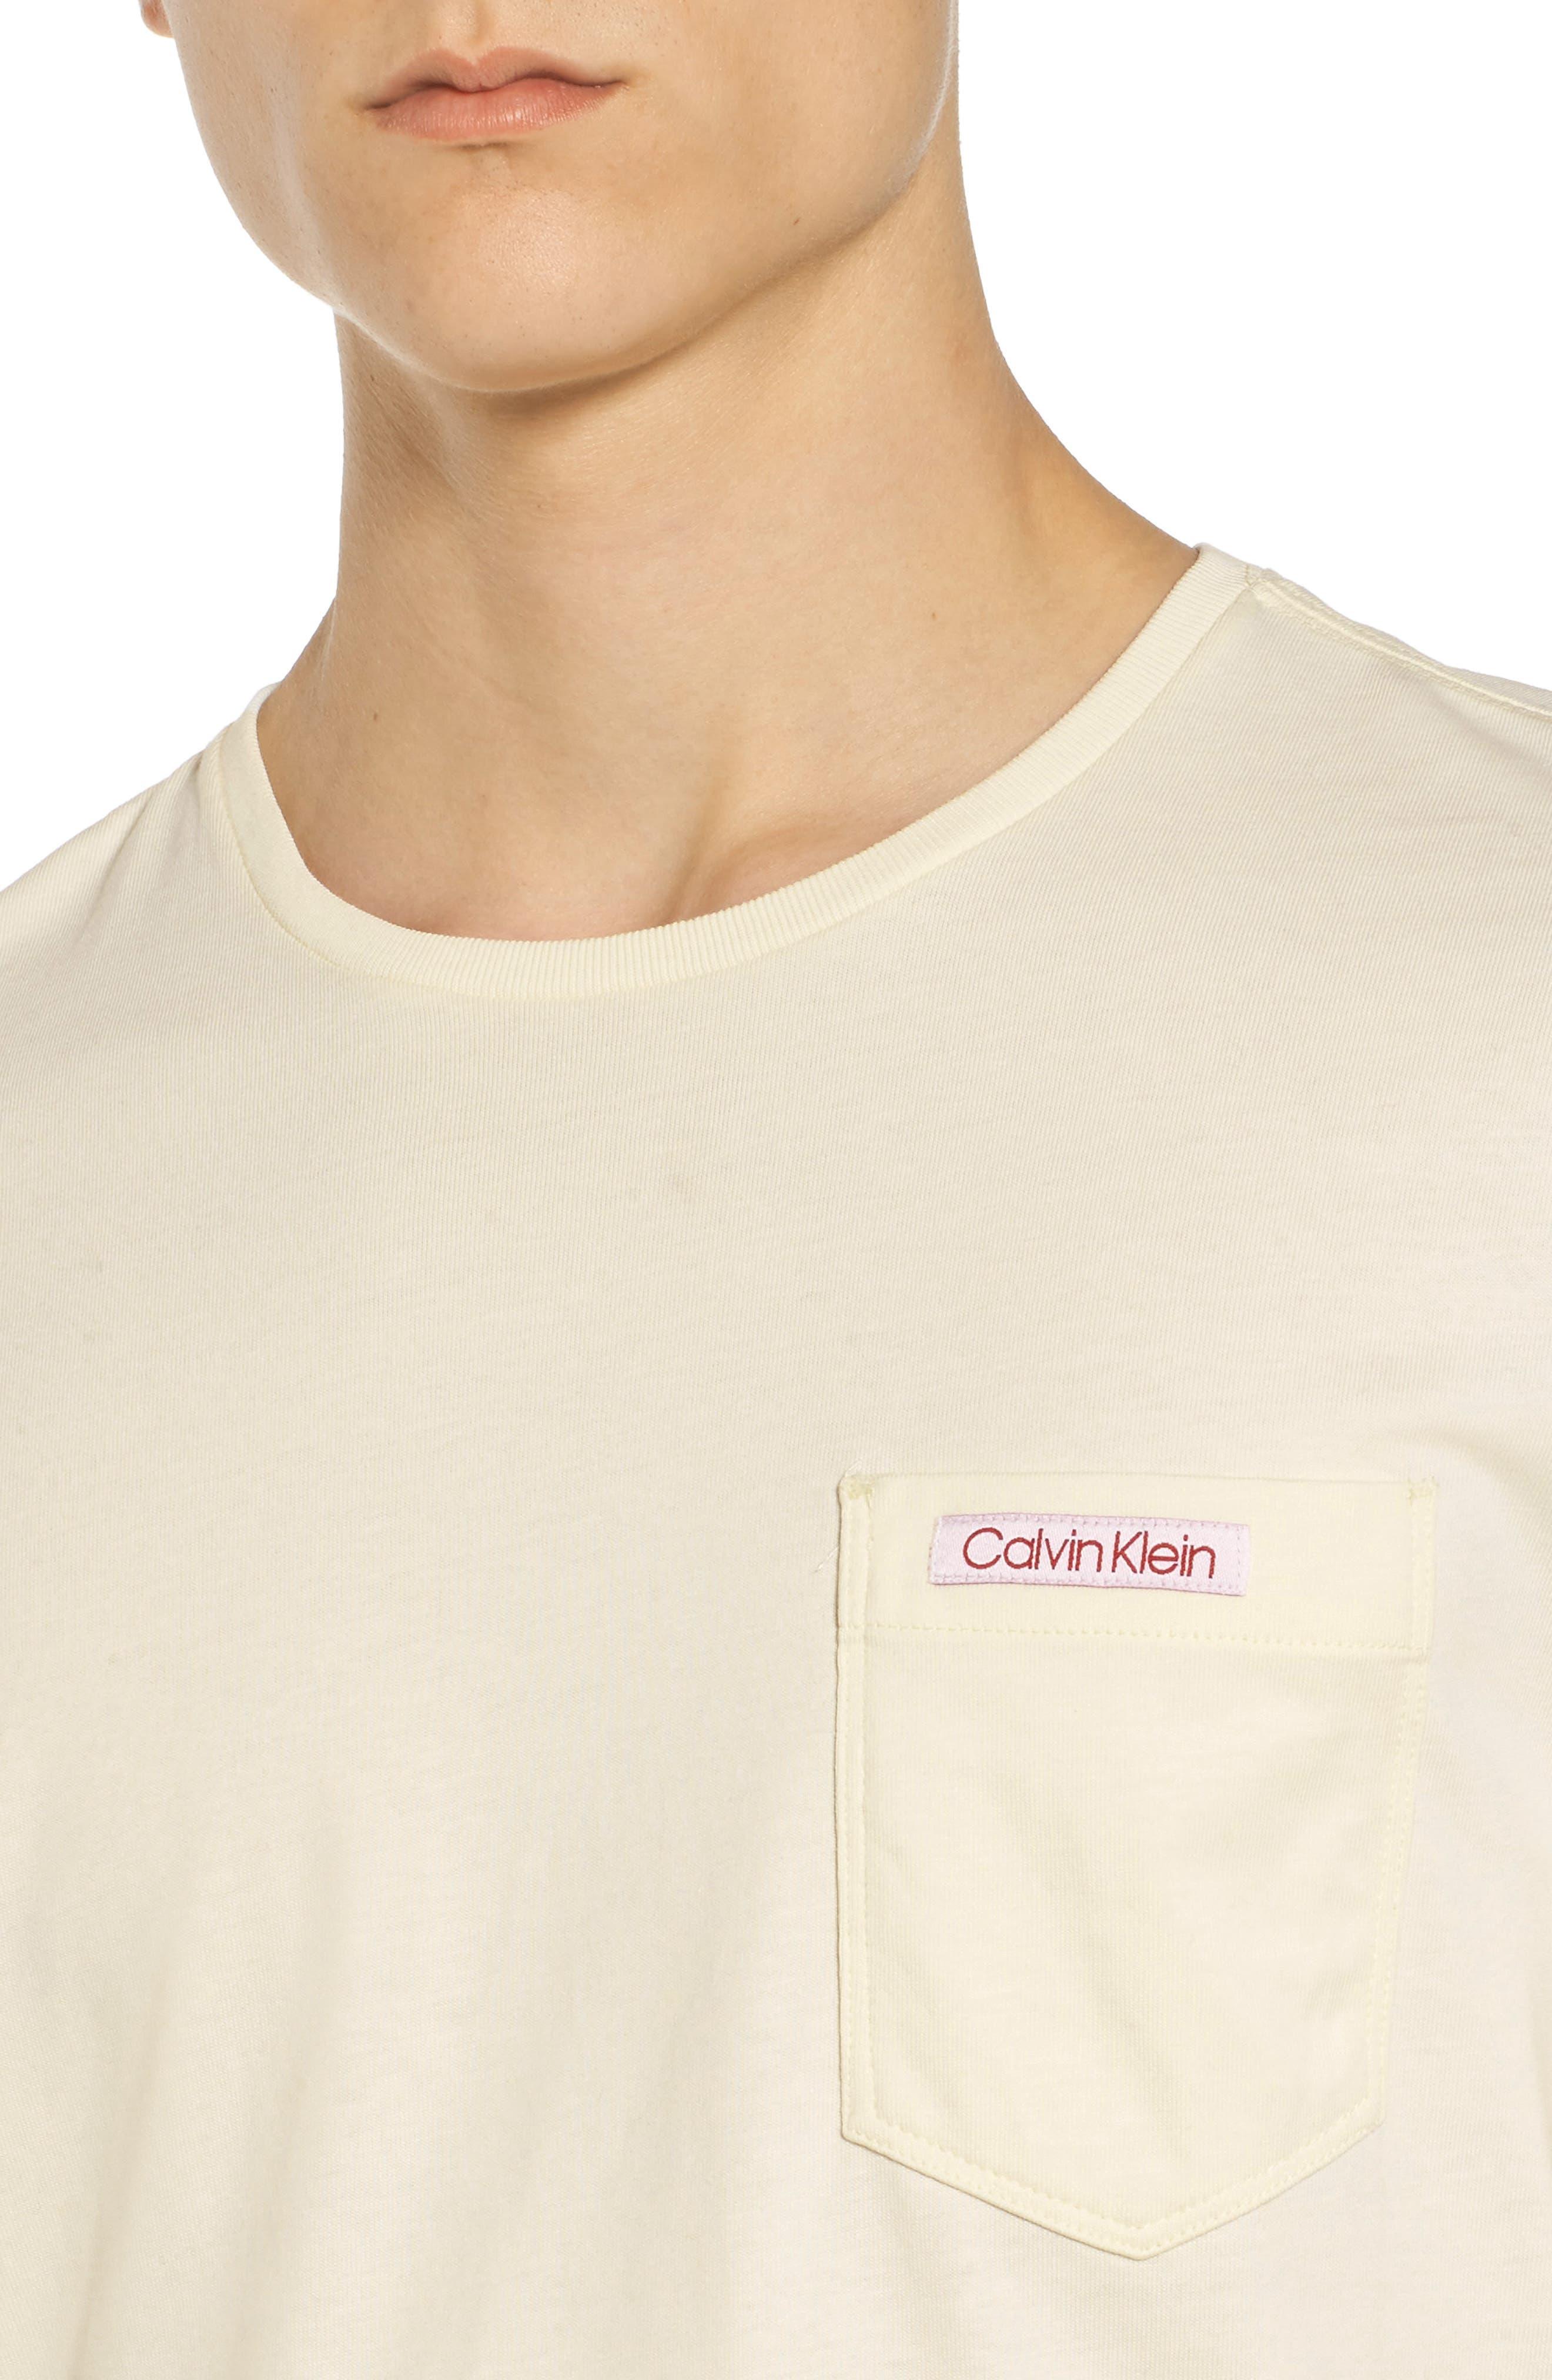 Label Pocket T-Shirt,                             Alternate thumbnail 4, color,